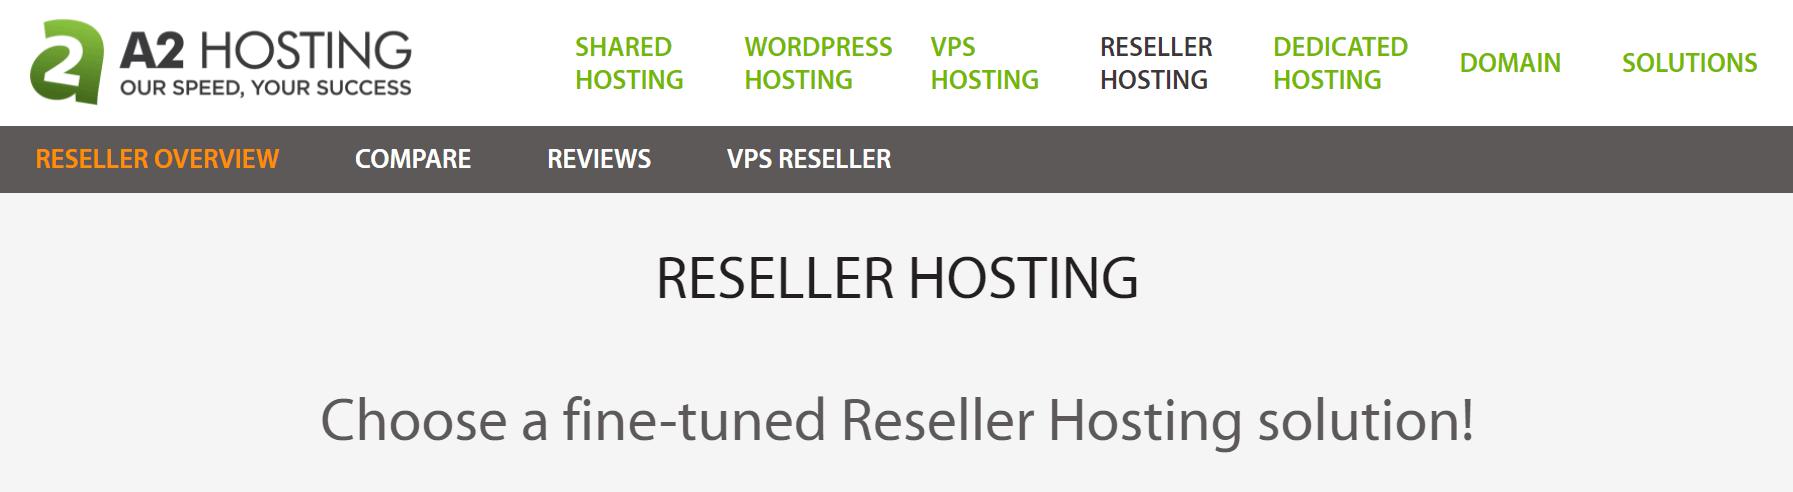 A2 Hosting's reseller hosting page.